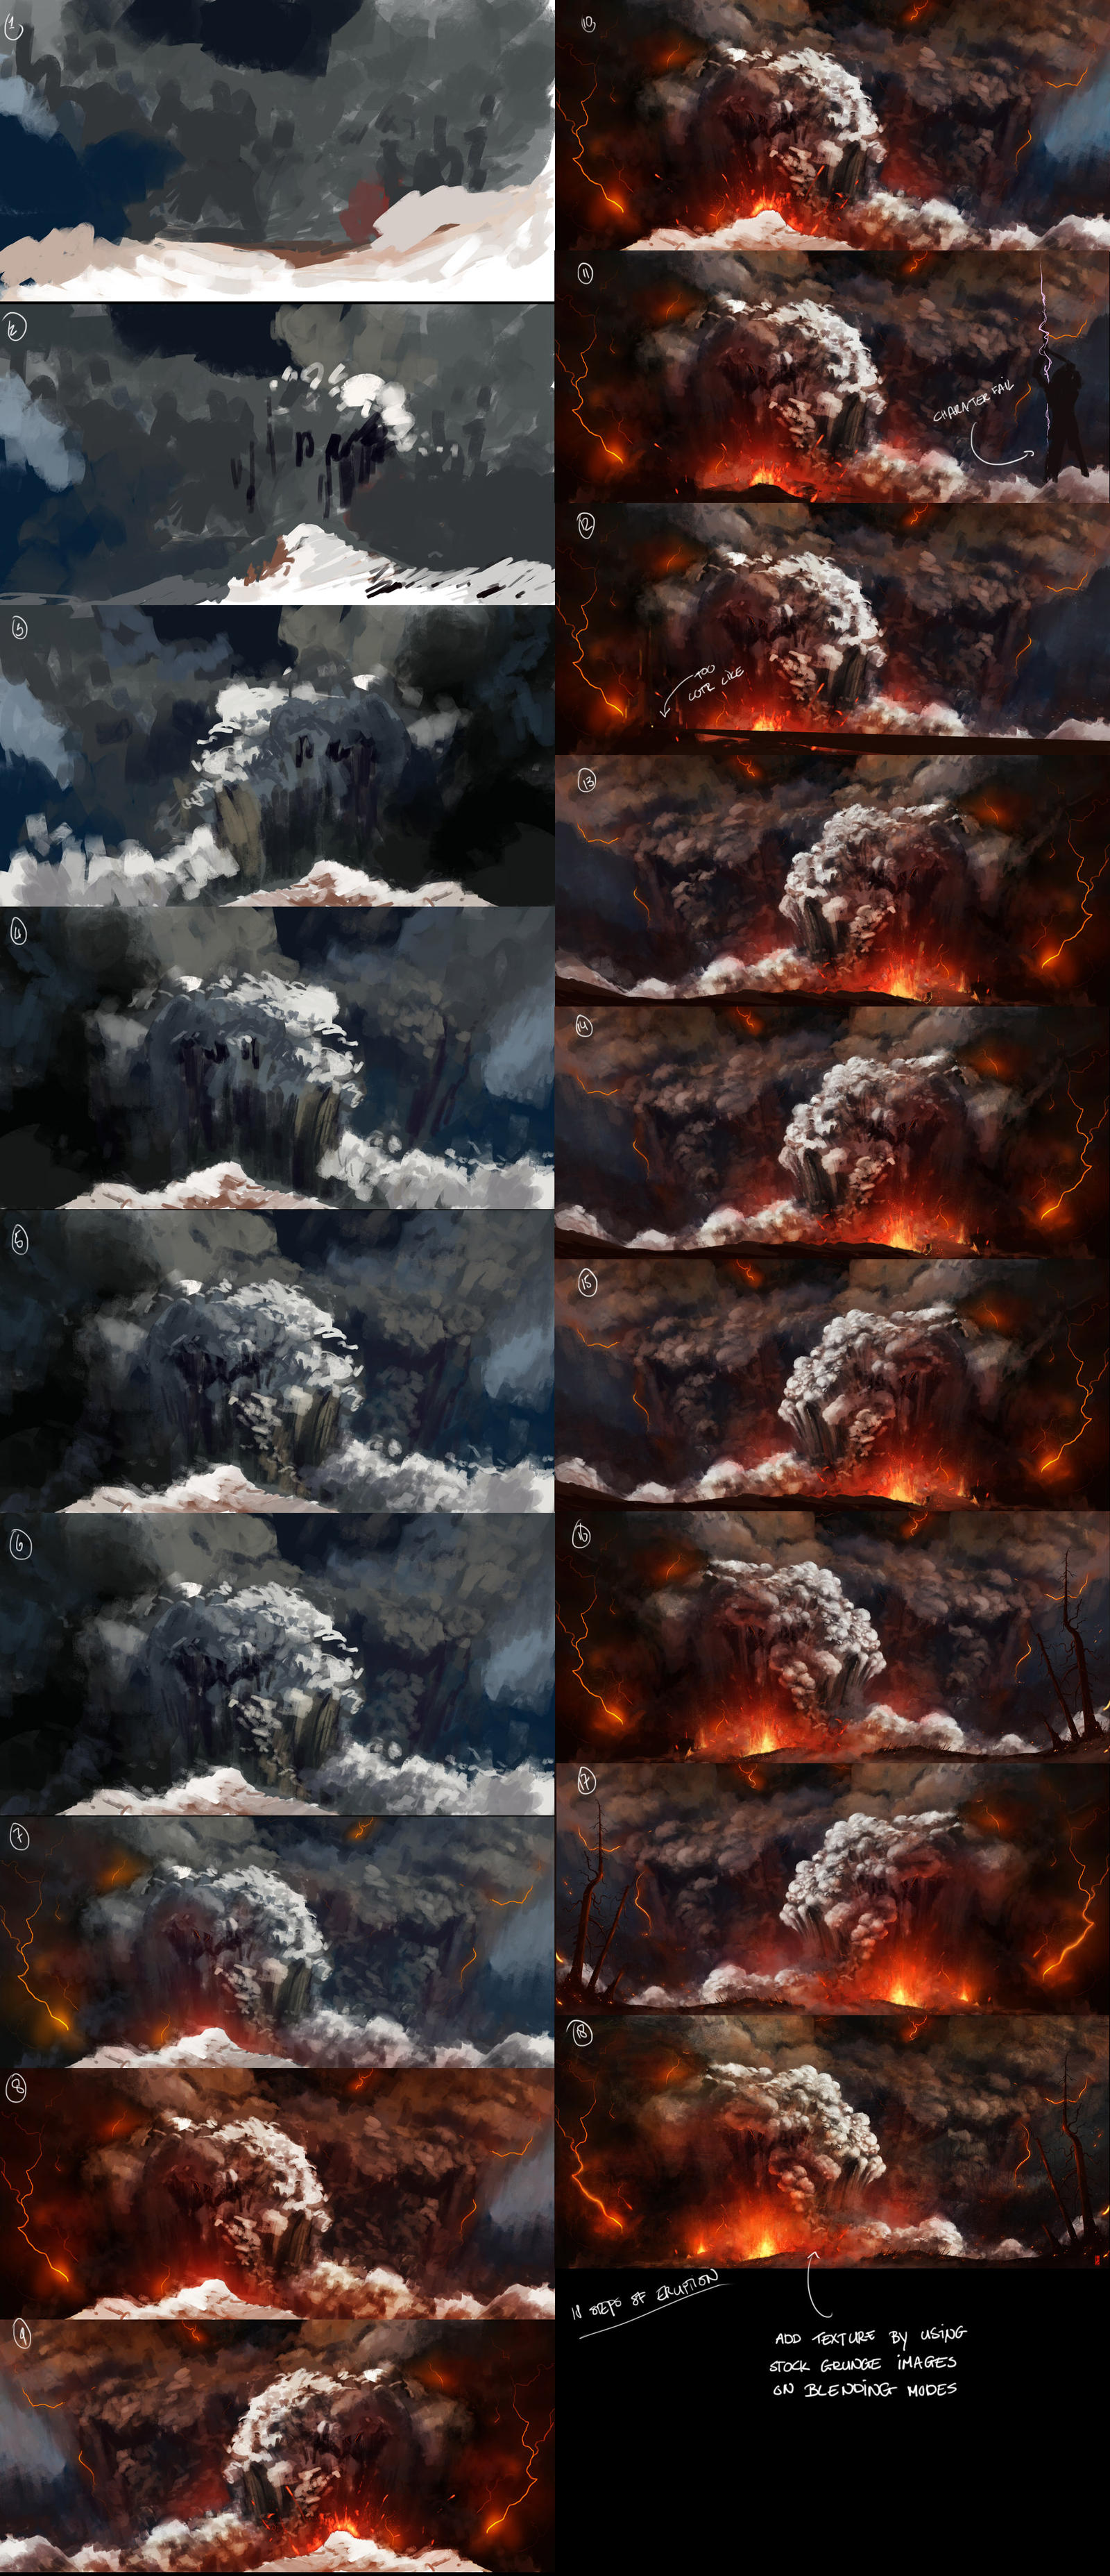 Eruption - steps by TitusLunter